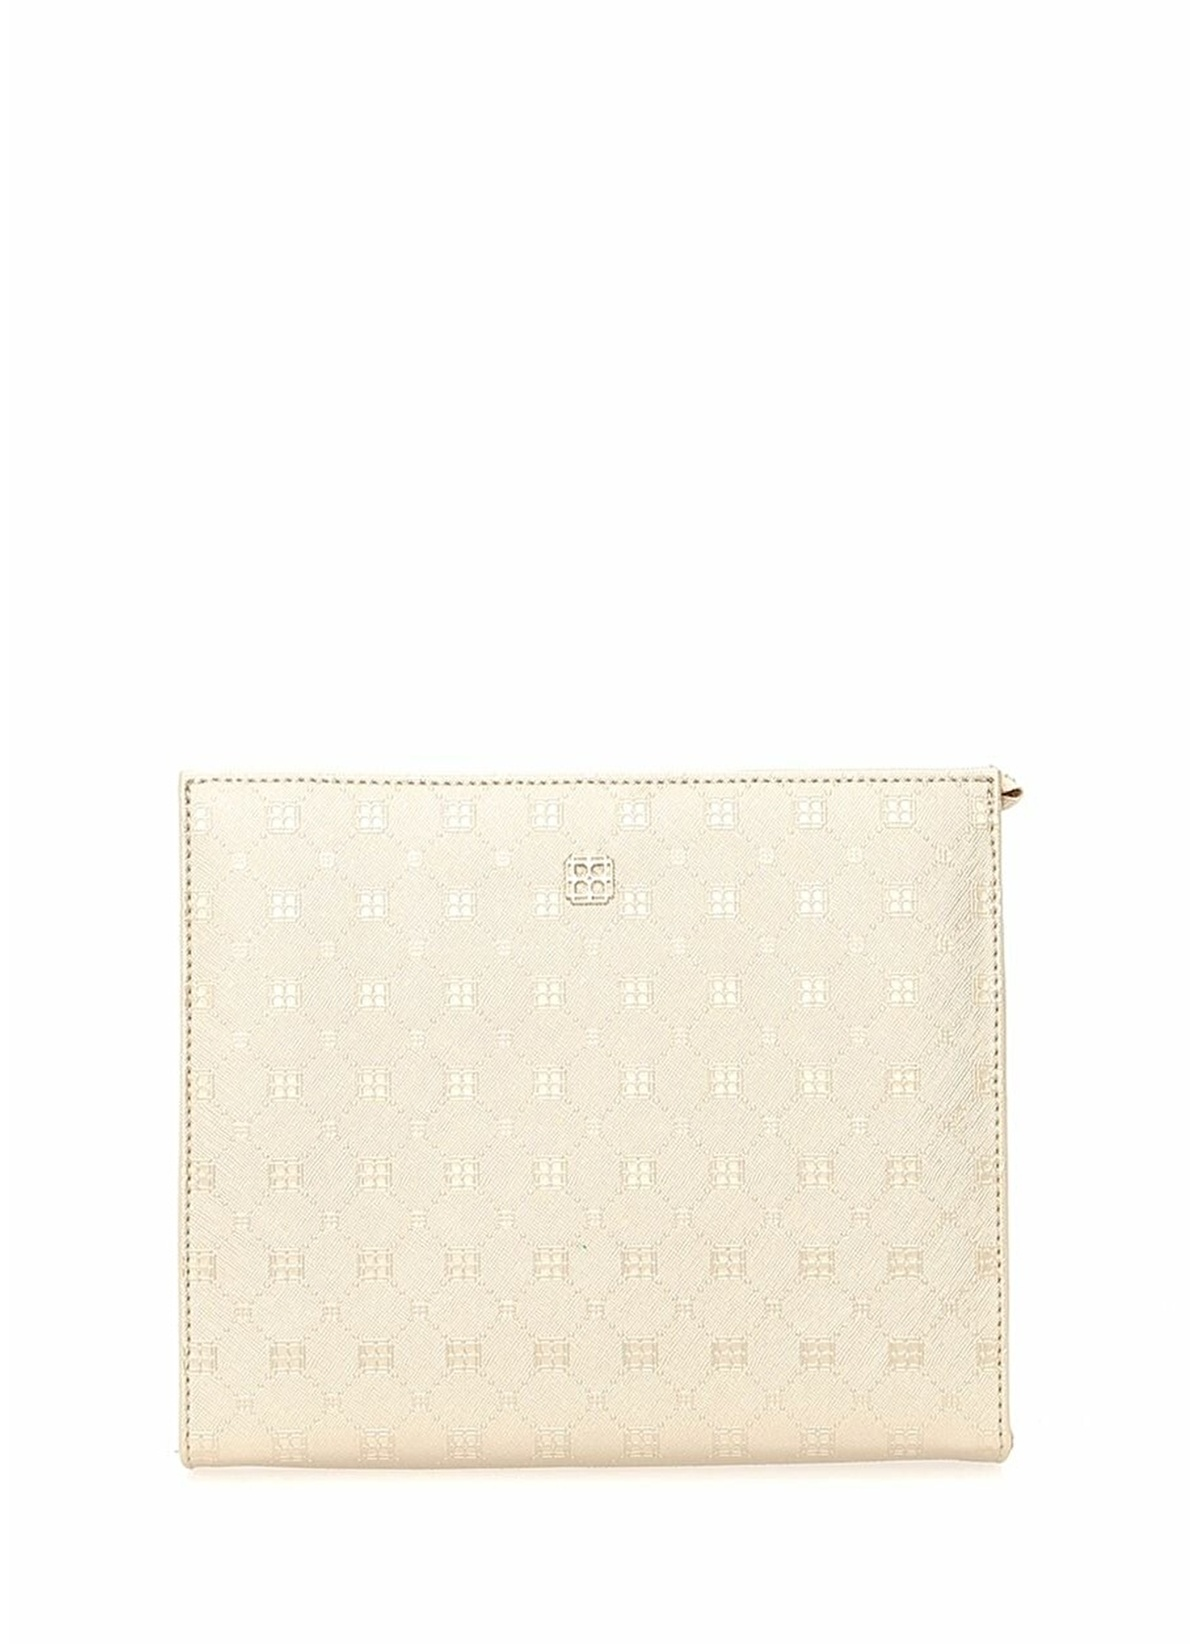 Beymen Clutch – El Çantası 101370552 K El Portföyü – 599.0 TL